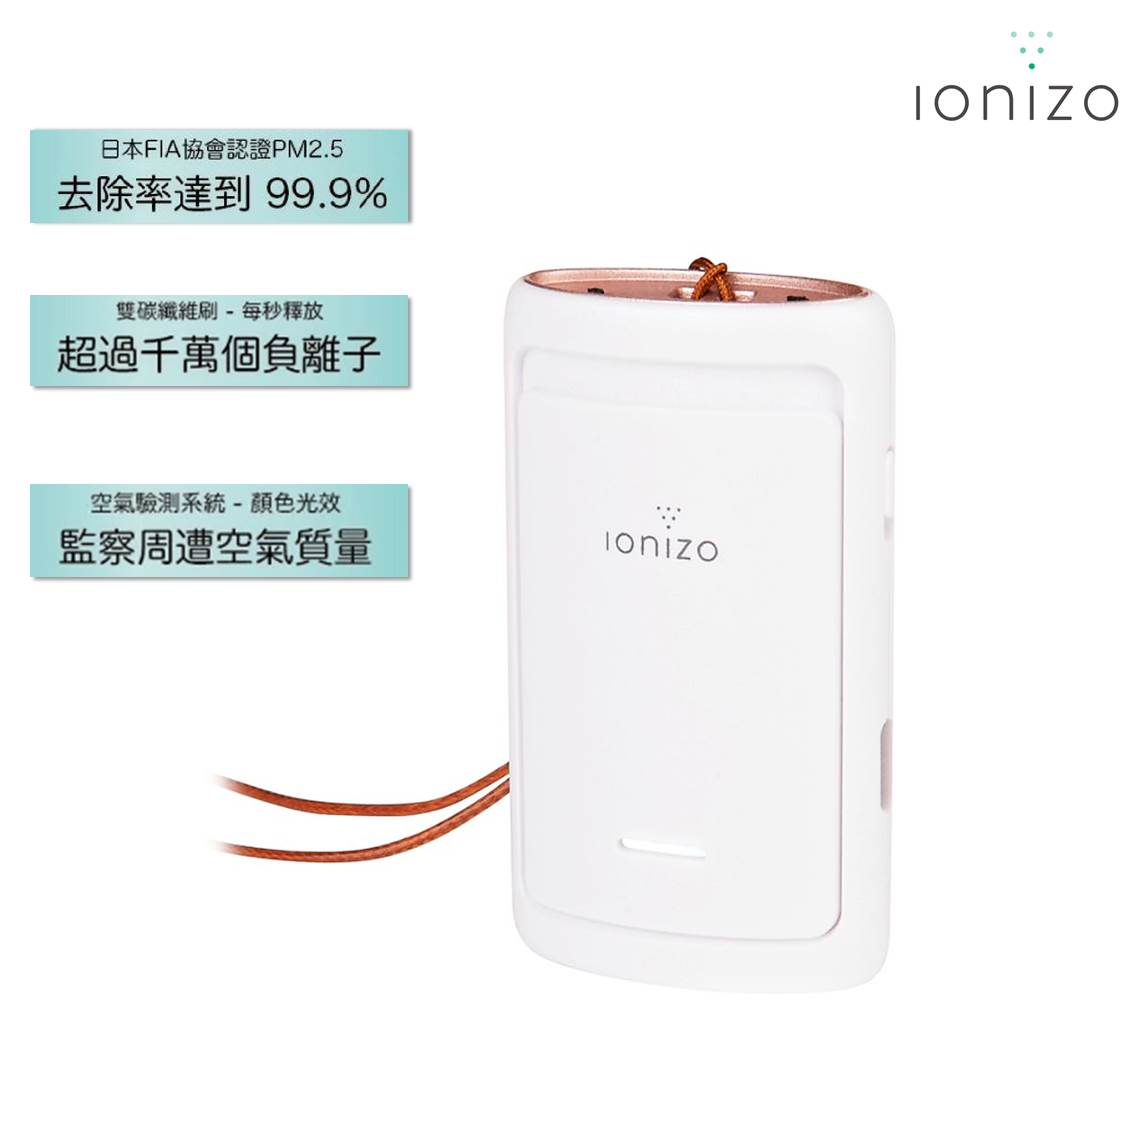 IONIZO2合1 隨身智能空氣淨化機+智能空氣驗測機 (金)